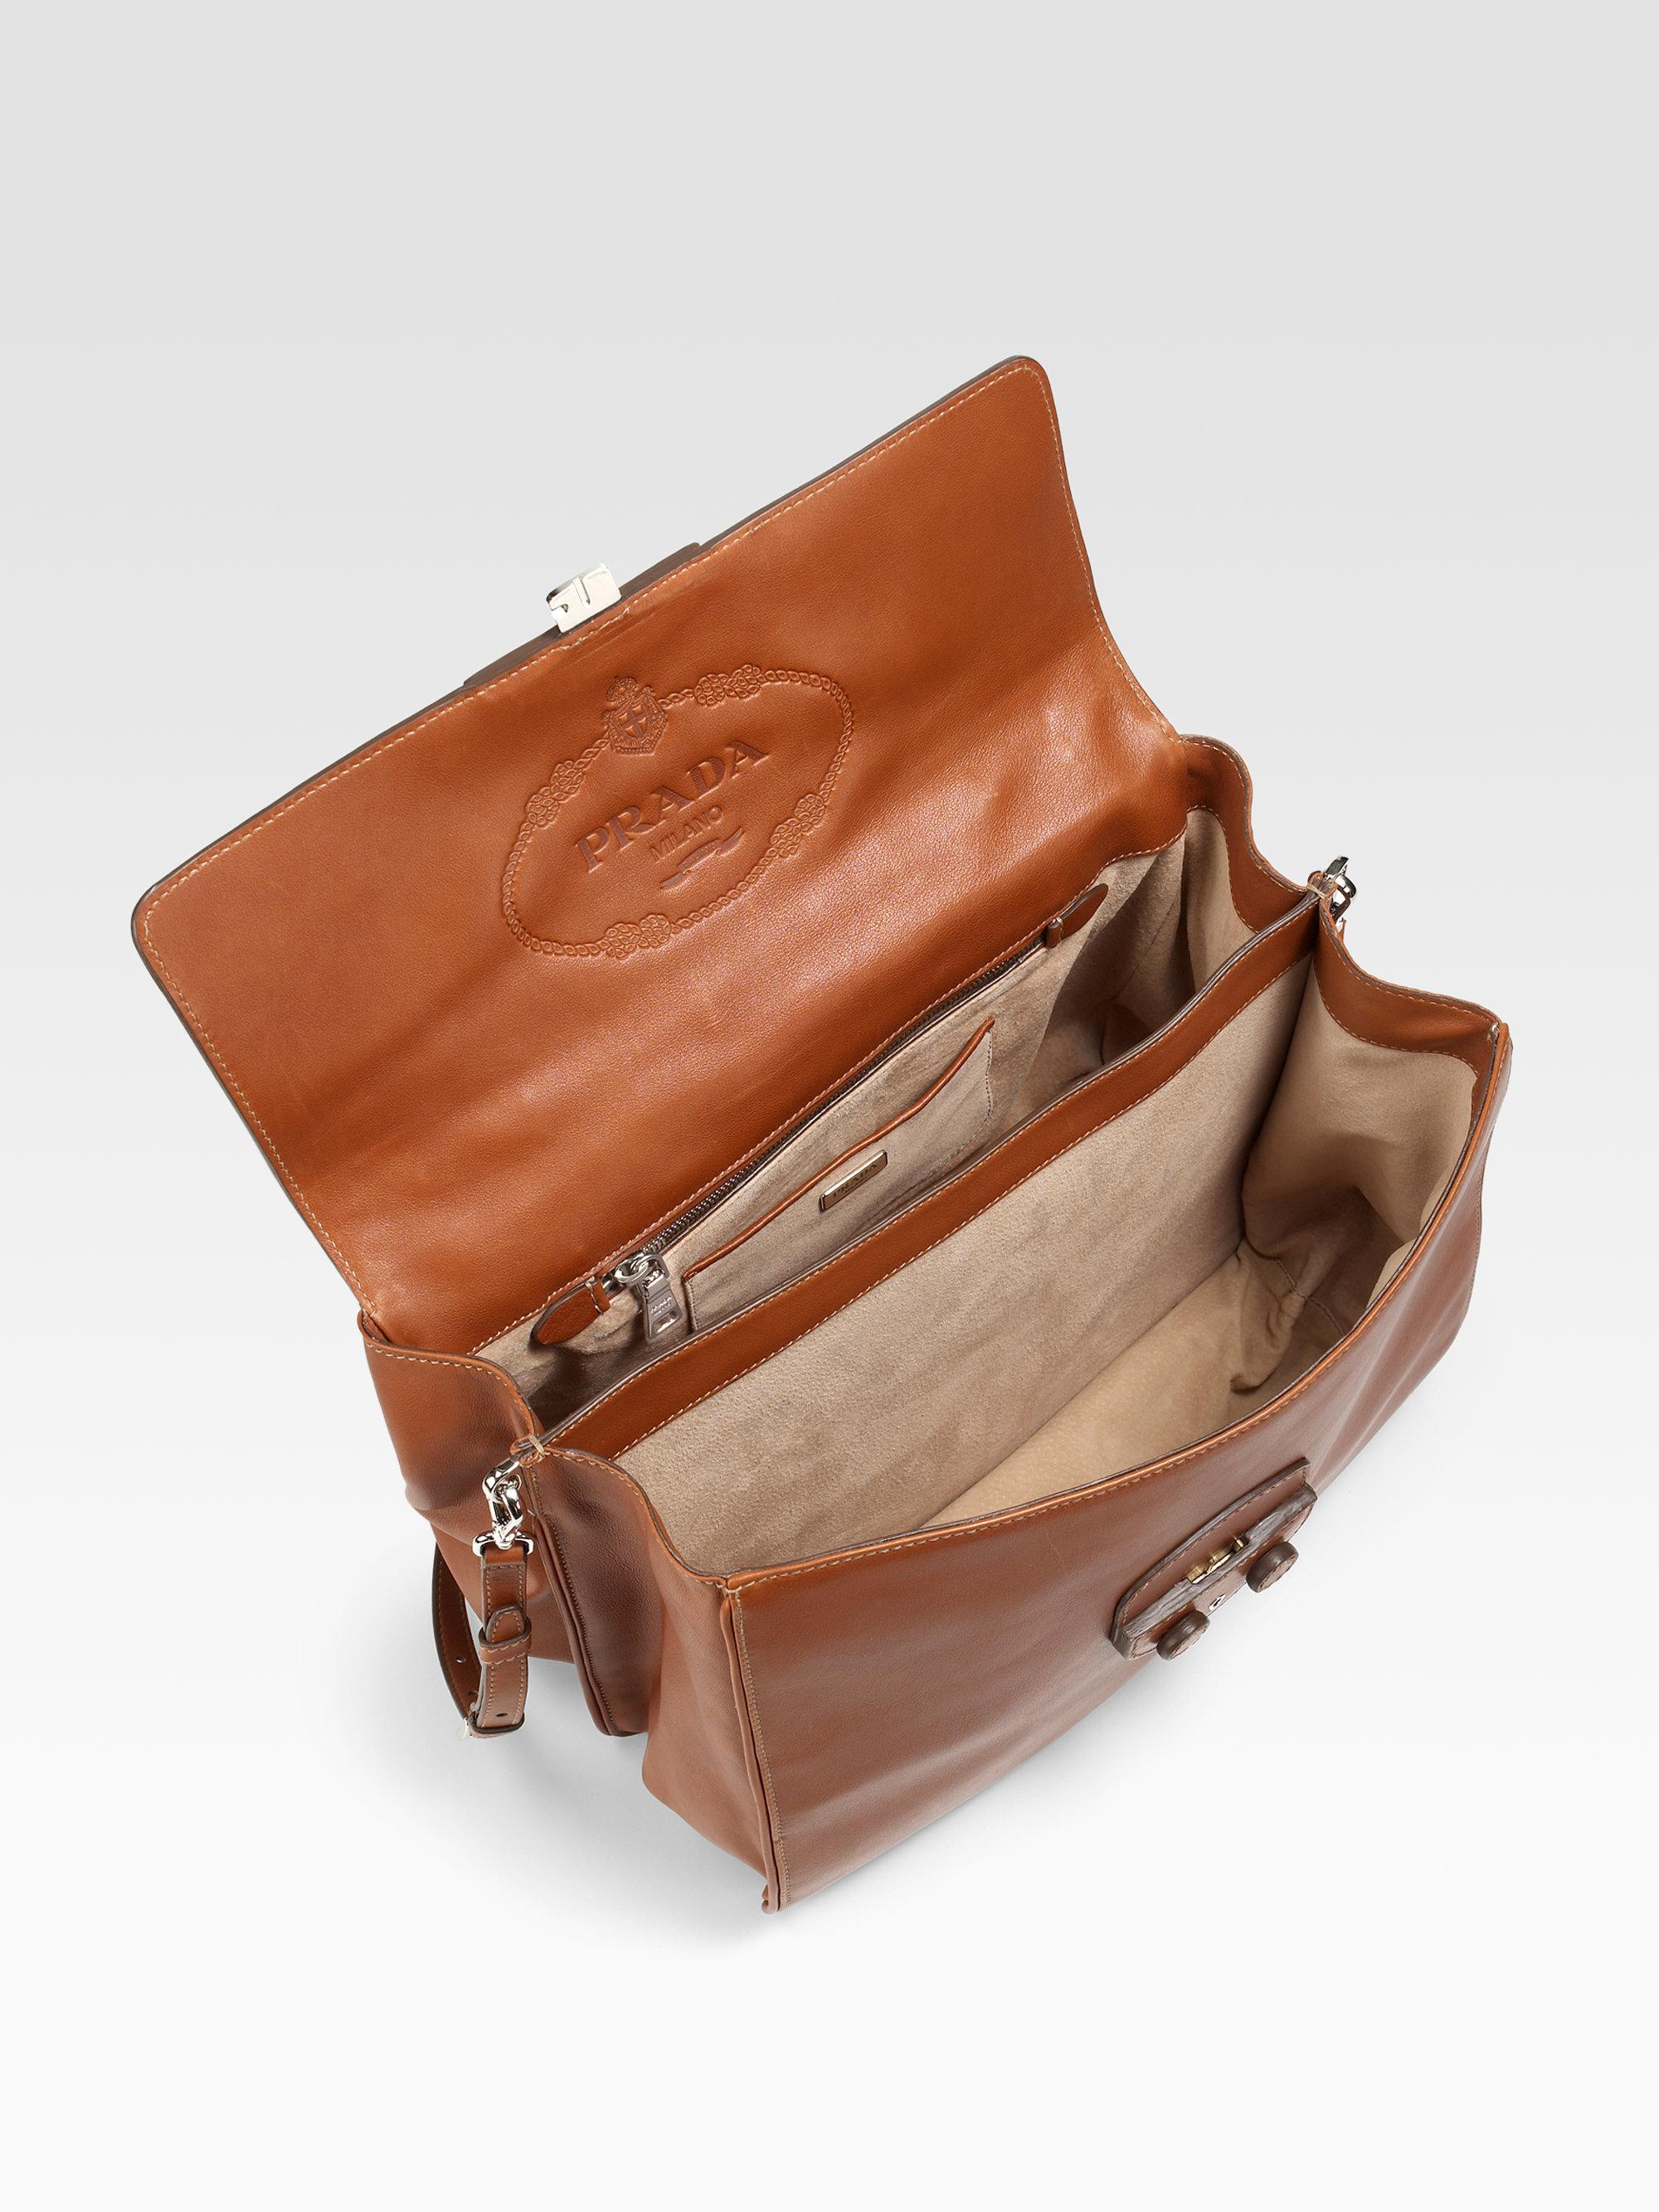 3f7c439b03f3 ... discount code for prada saffiano leather bag lyst prada city calf tote  in brown 7042c 8bcf9